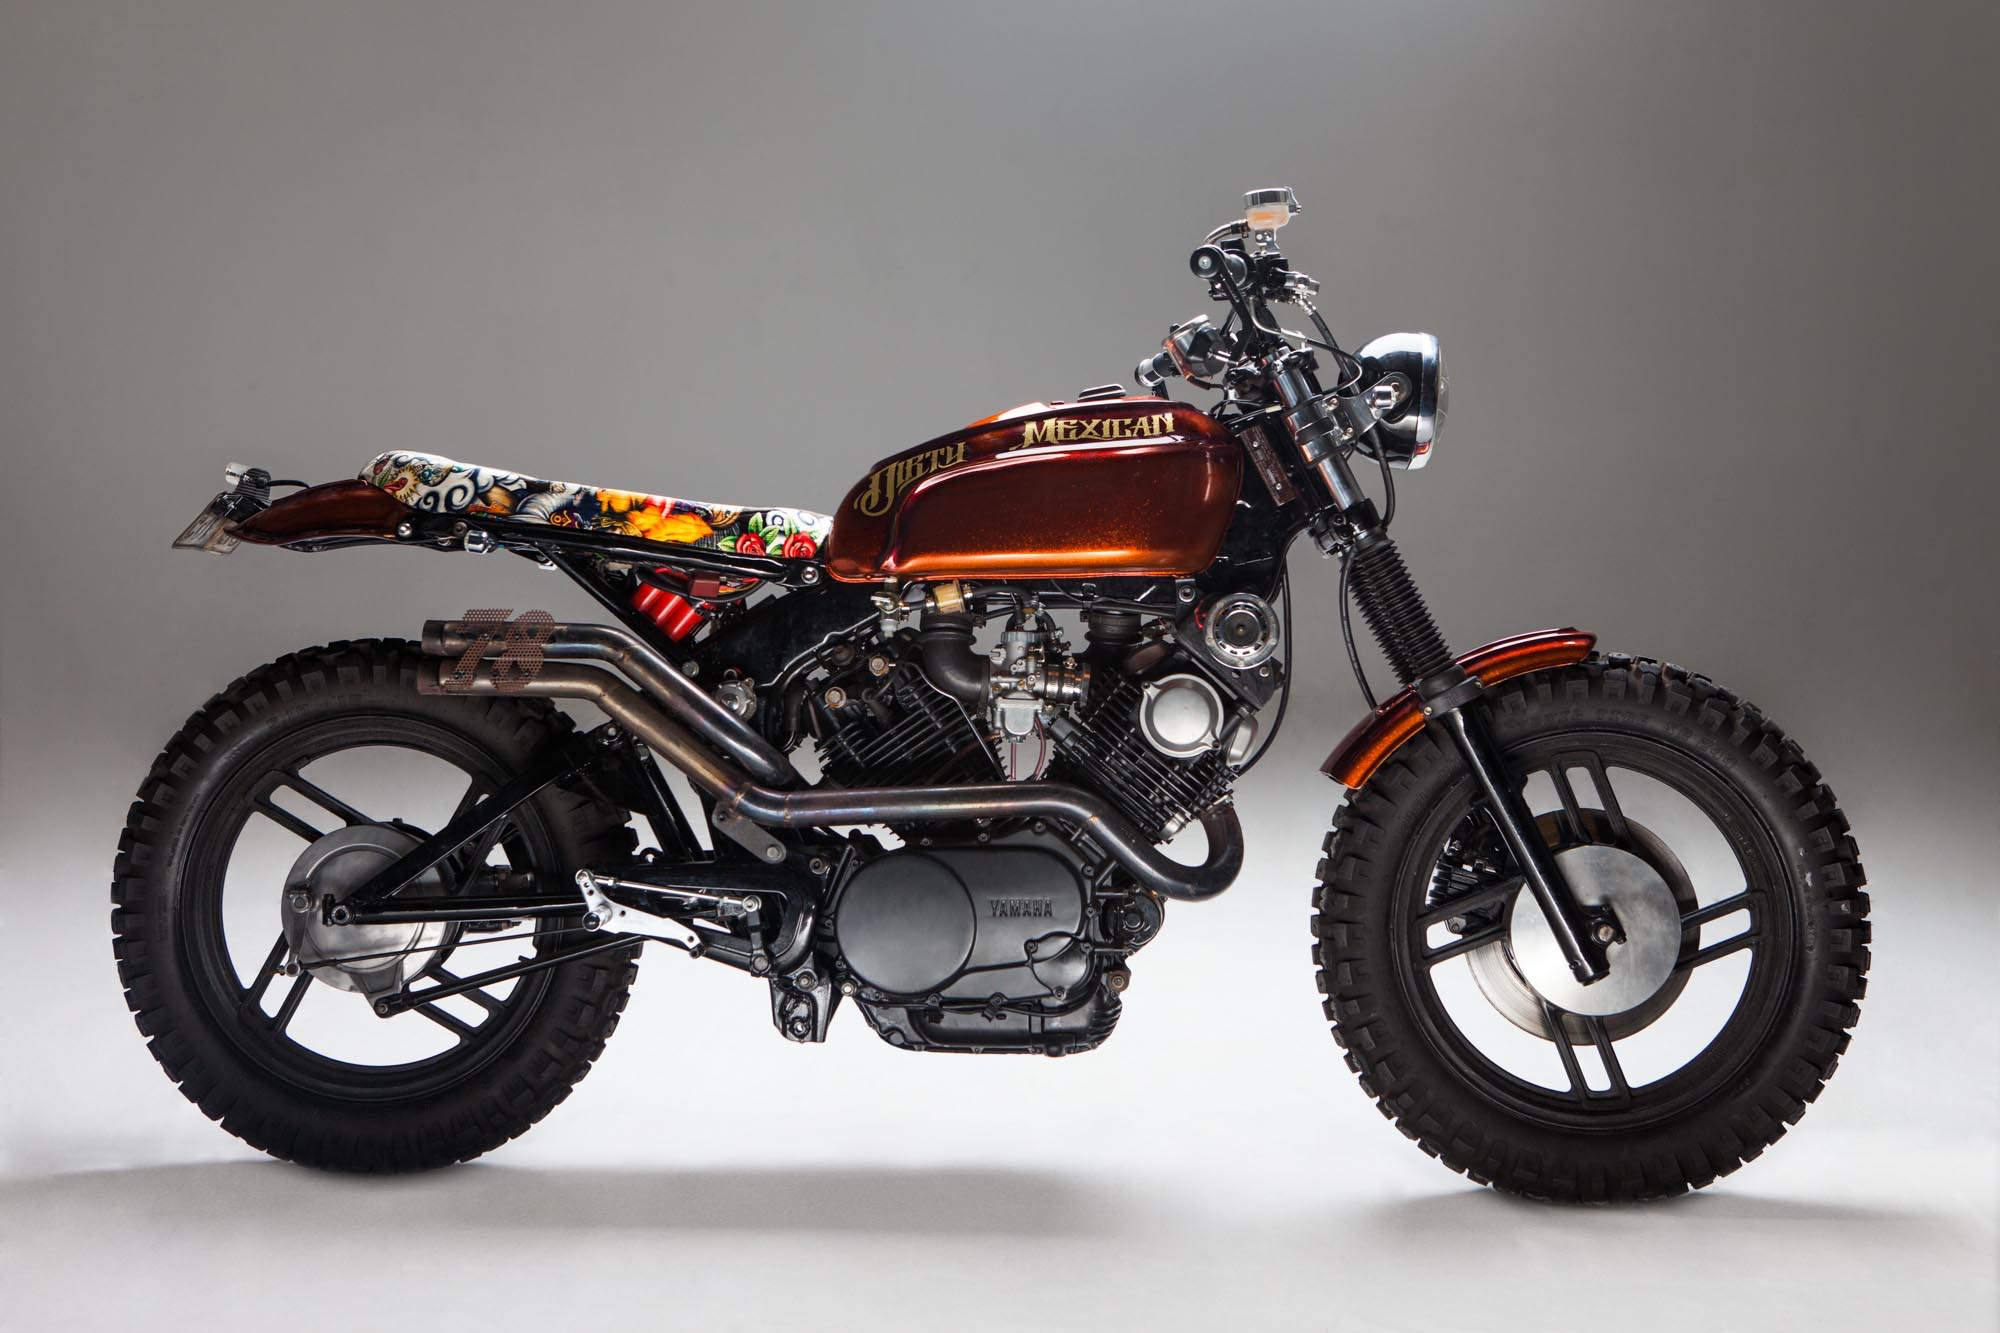 Build A Honda >> Yamaha Virago 750 Custom Scrambler Leaves You Drooling ...